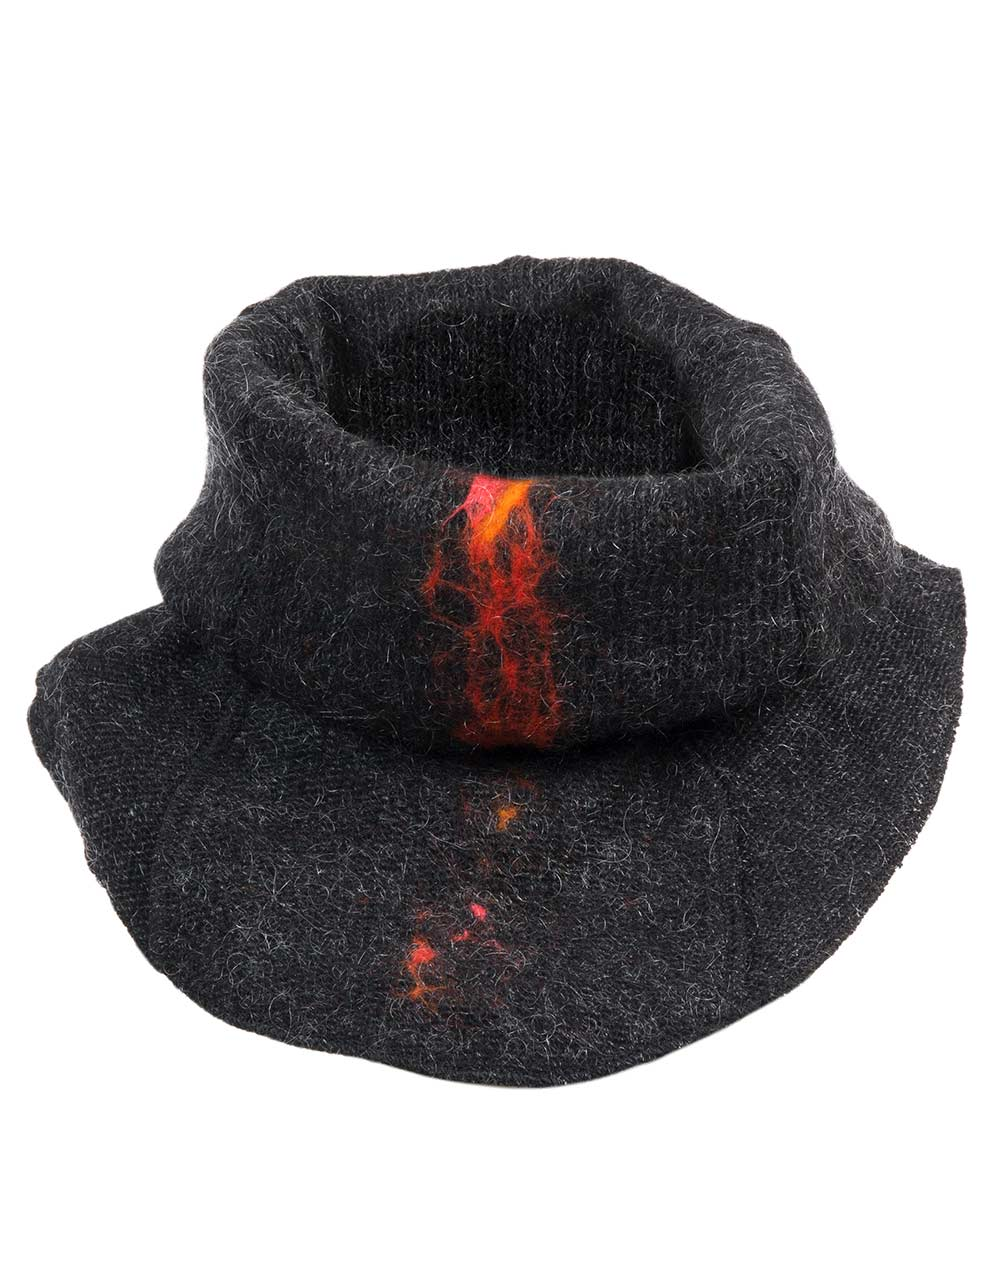 lava neck-warmer, black heather, gjoska.is